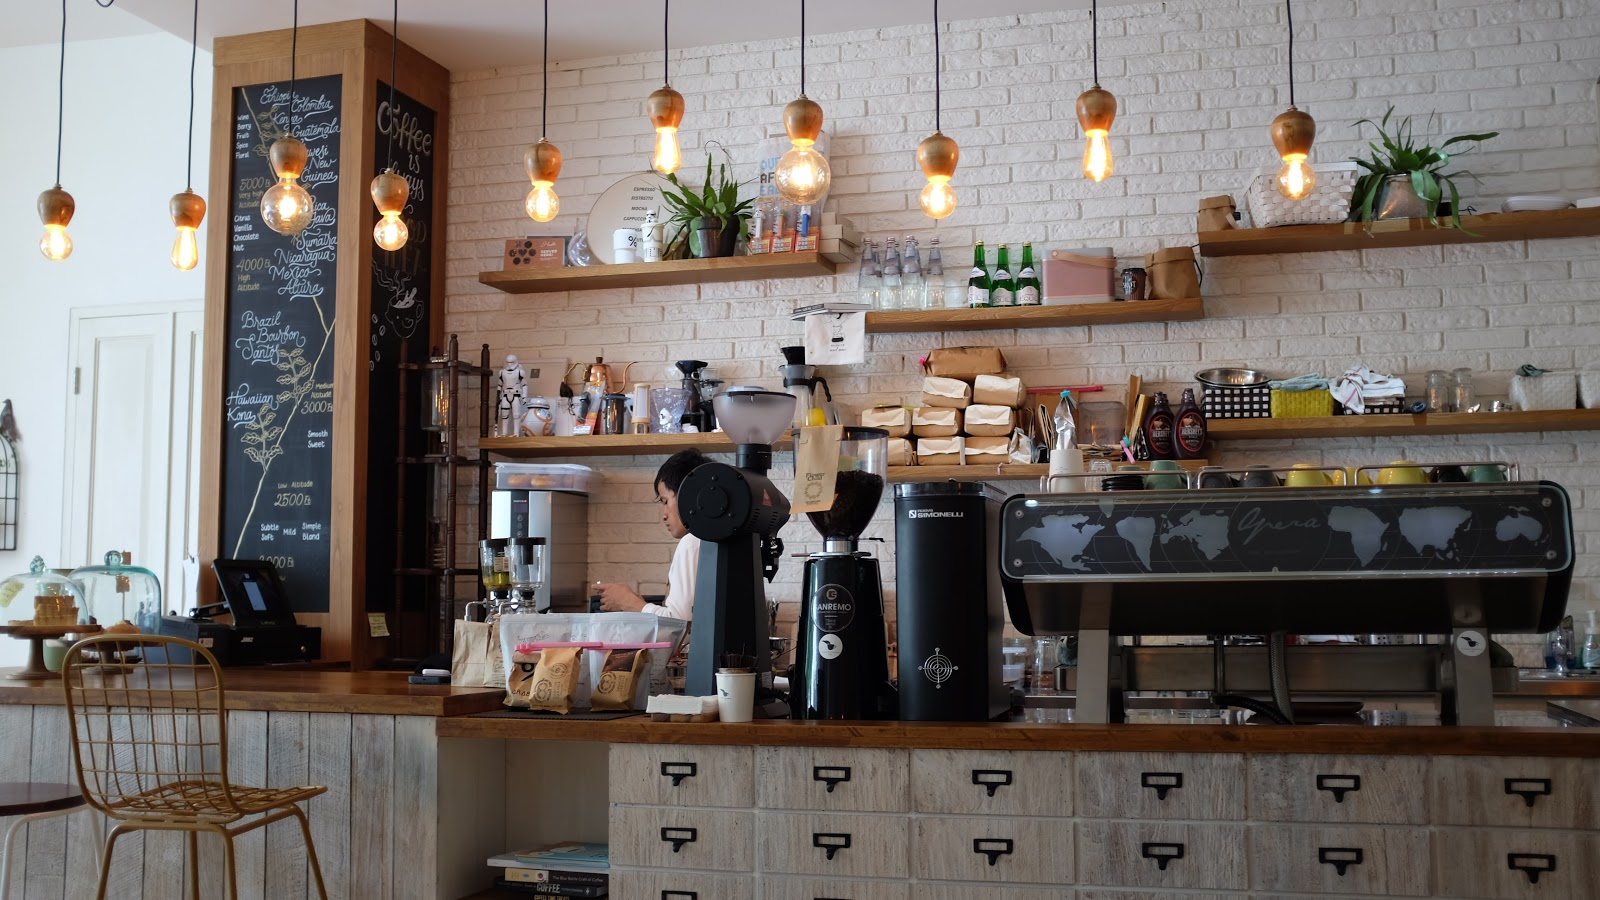 Westwood coffee shop